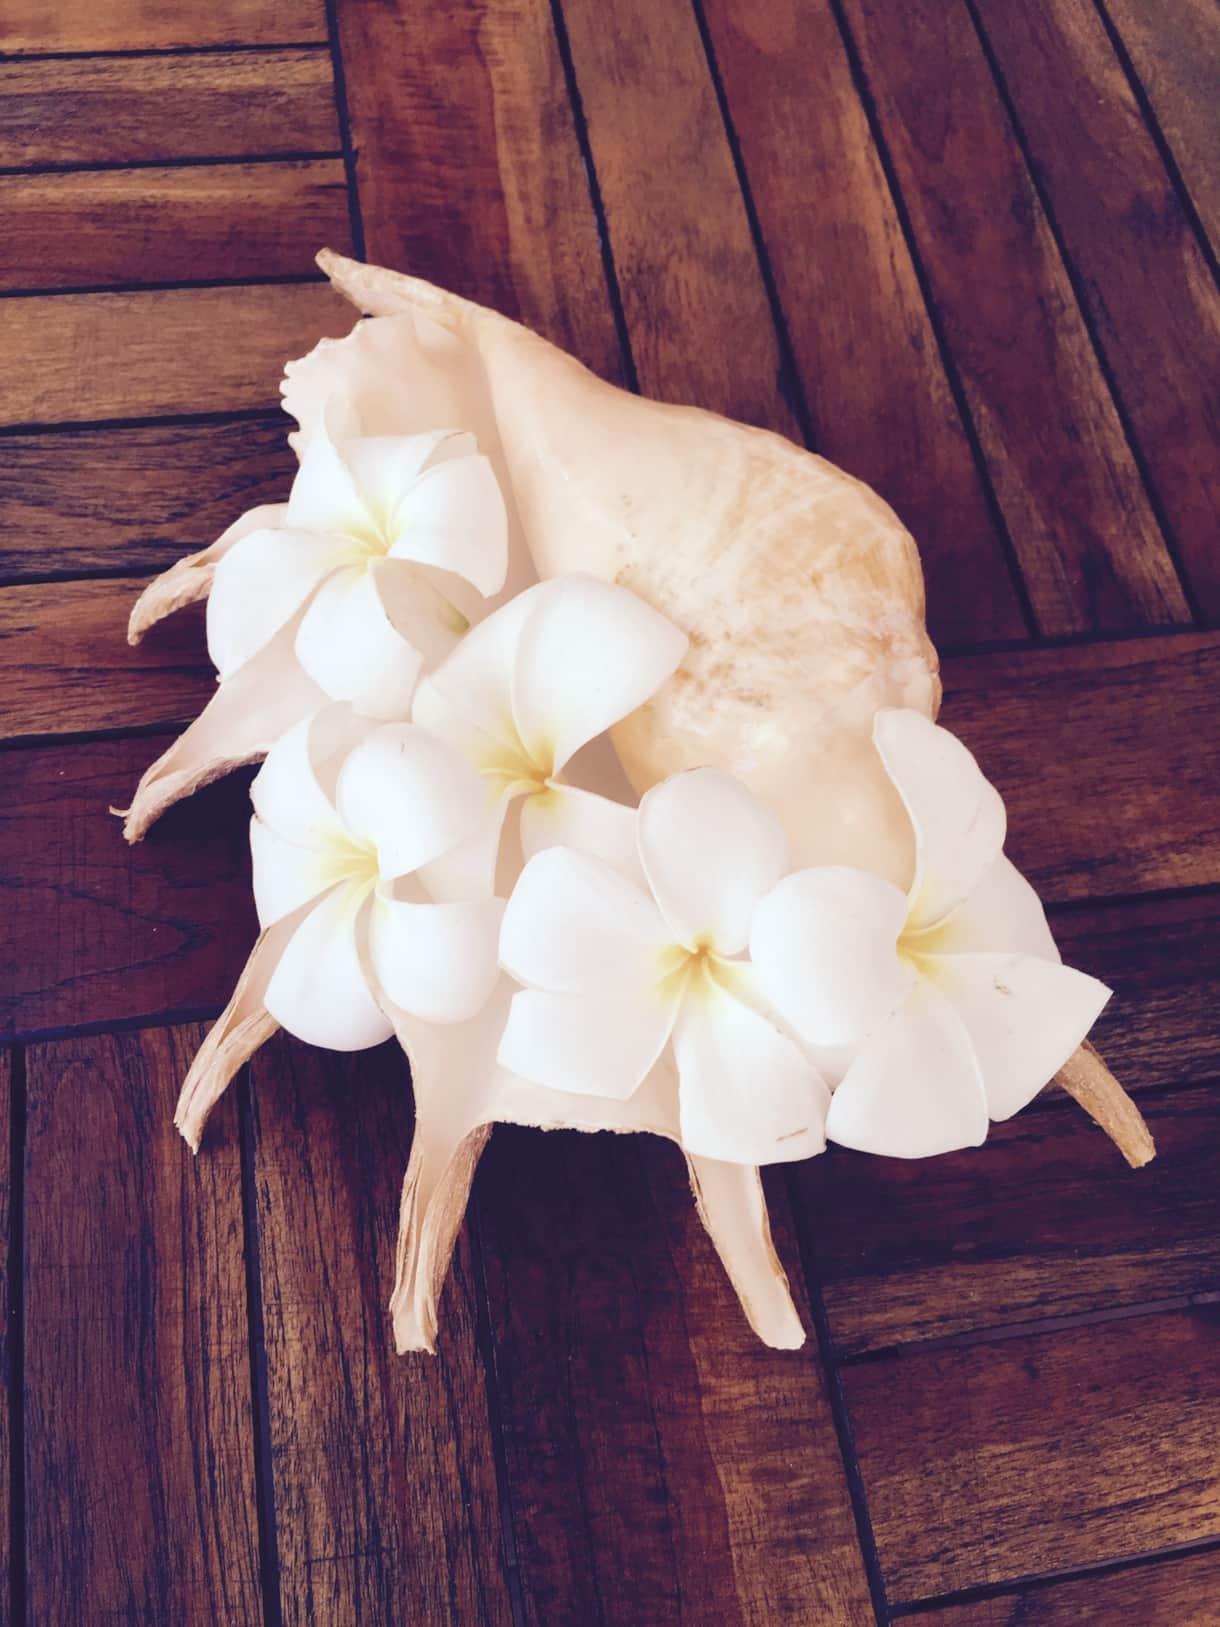 Beach House garden has frangipani tree